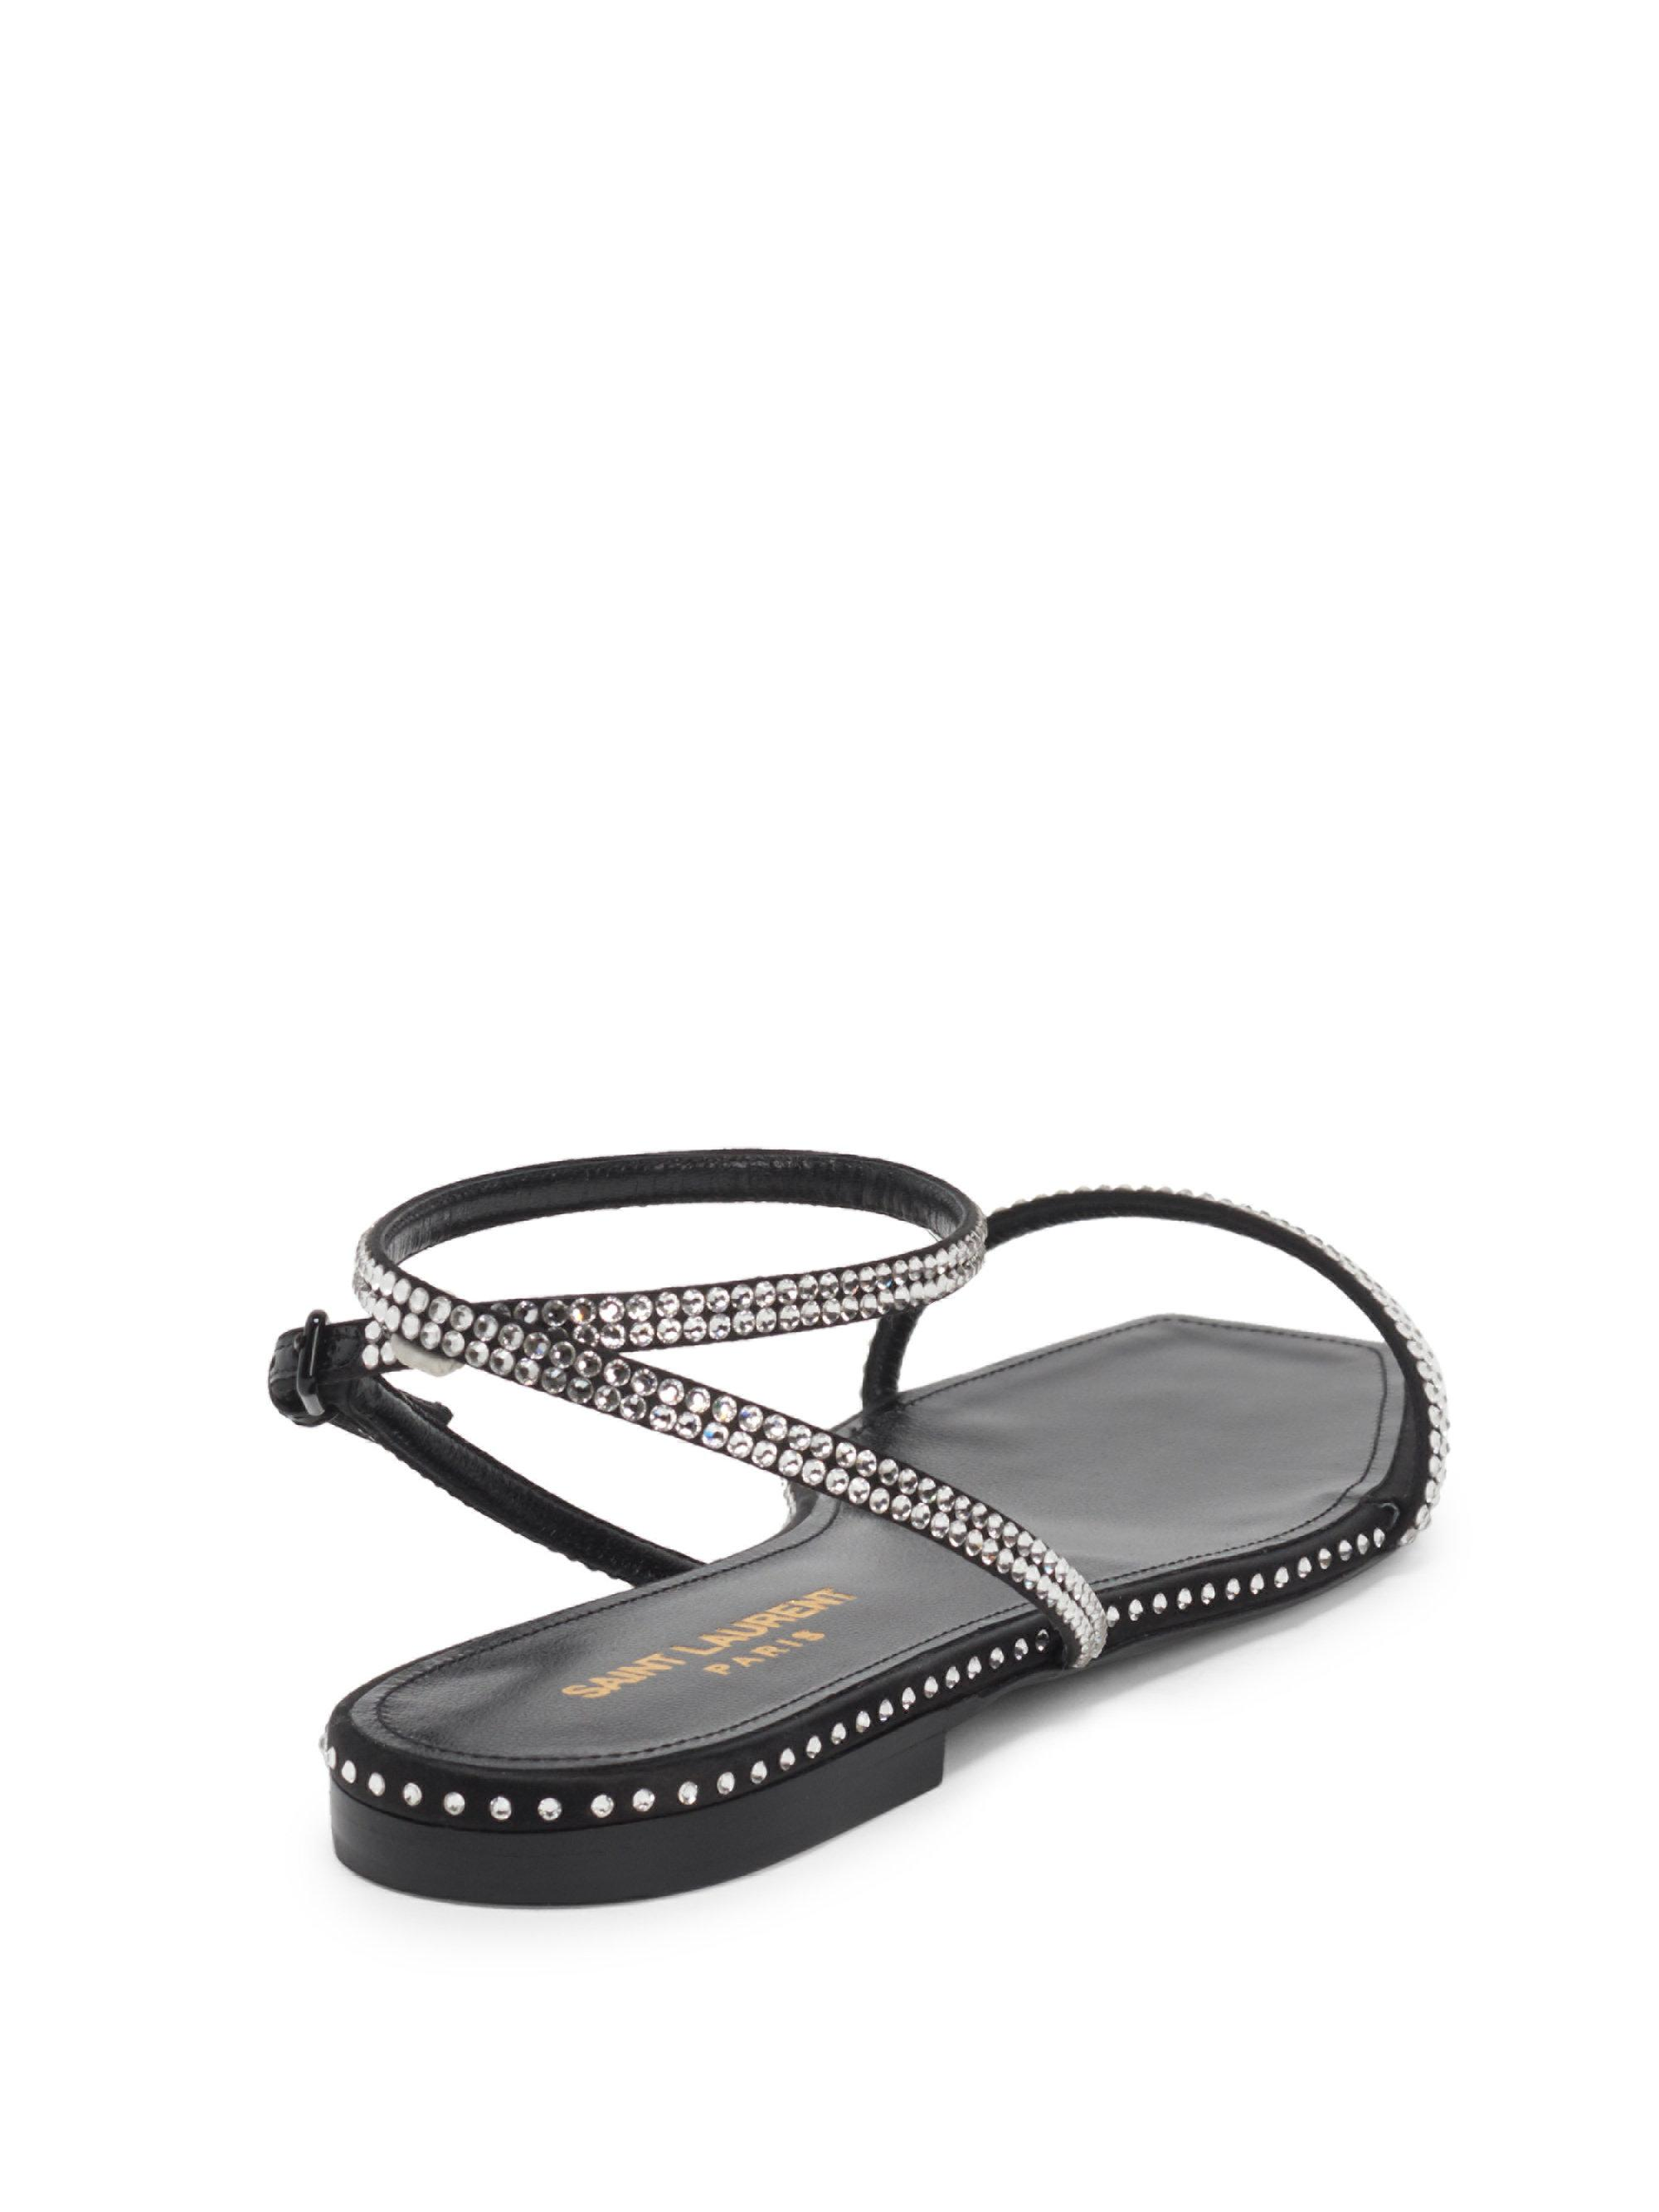 26996d53c77 Lyst - Saint Laurent Nu Pied Raso Crystal Ankle-strap Sandals in Black